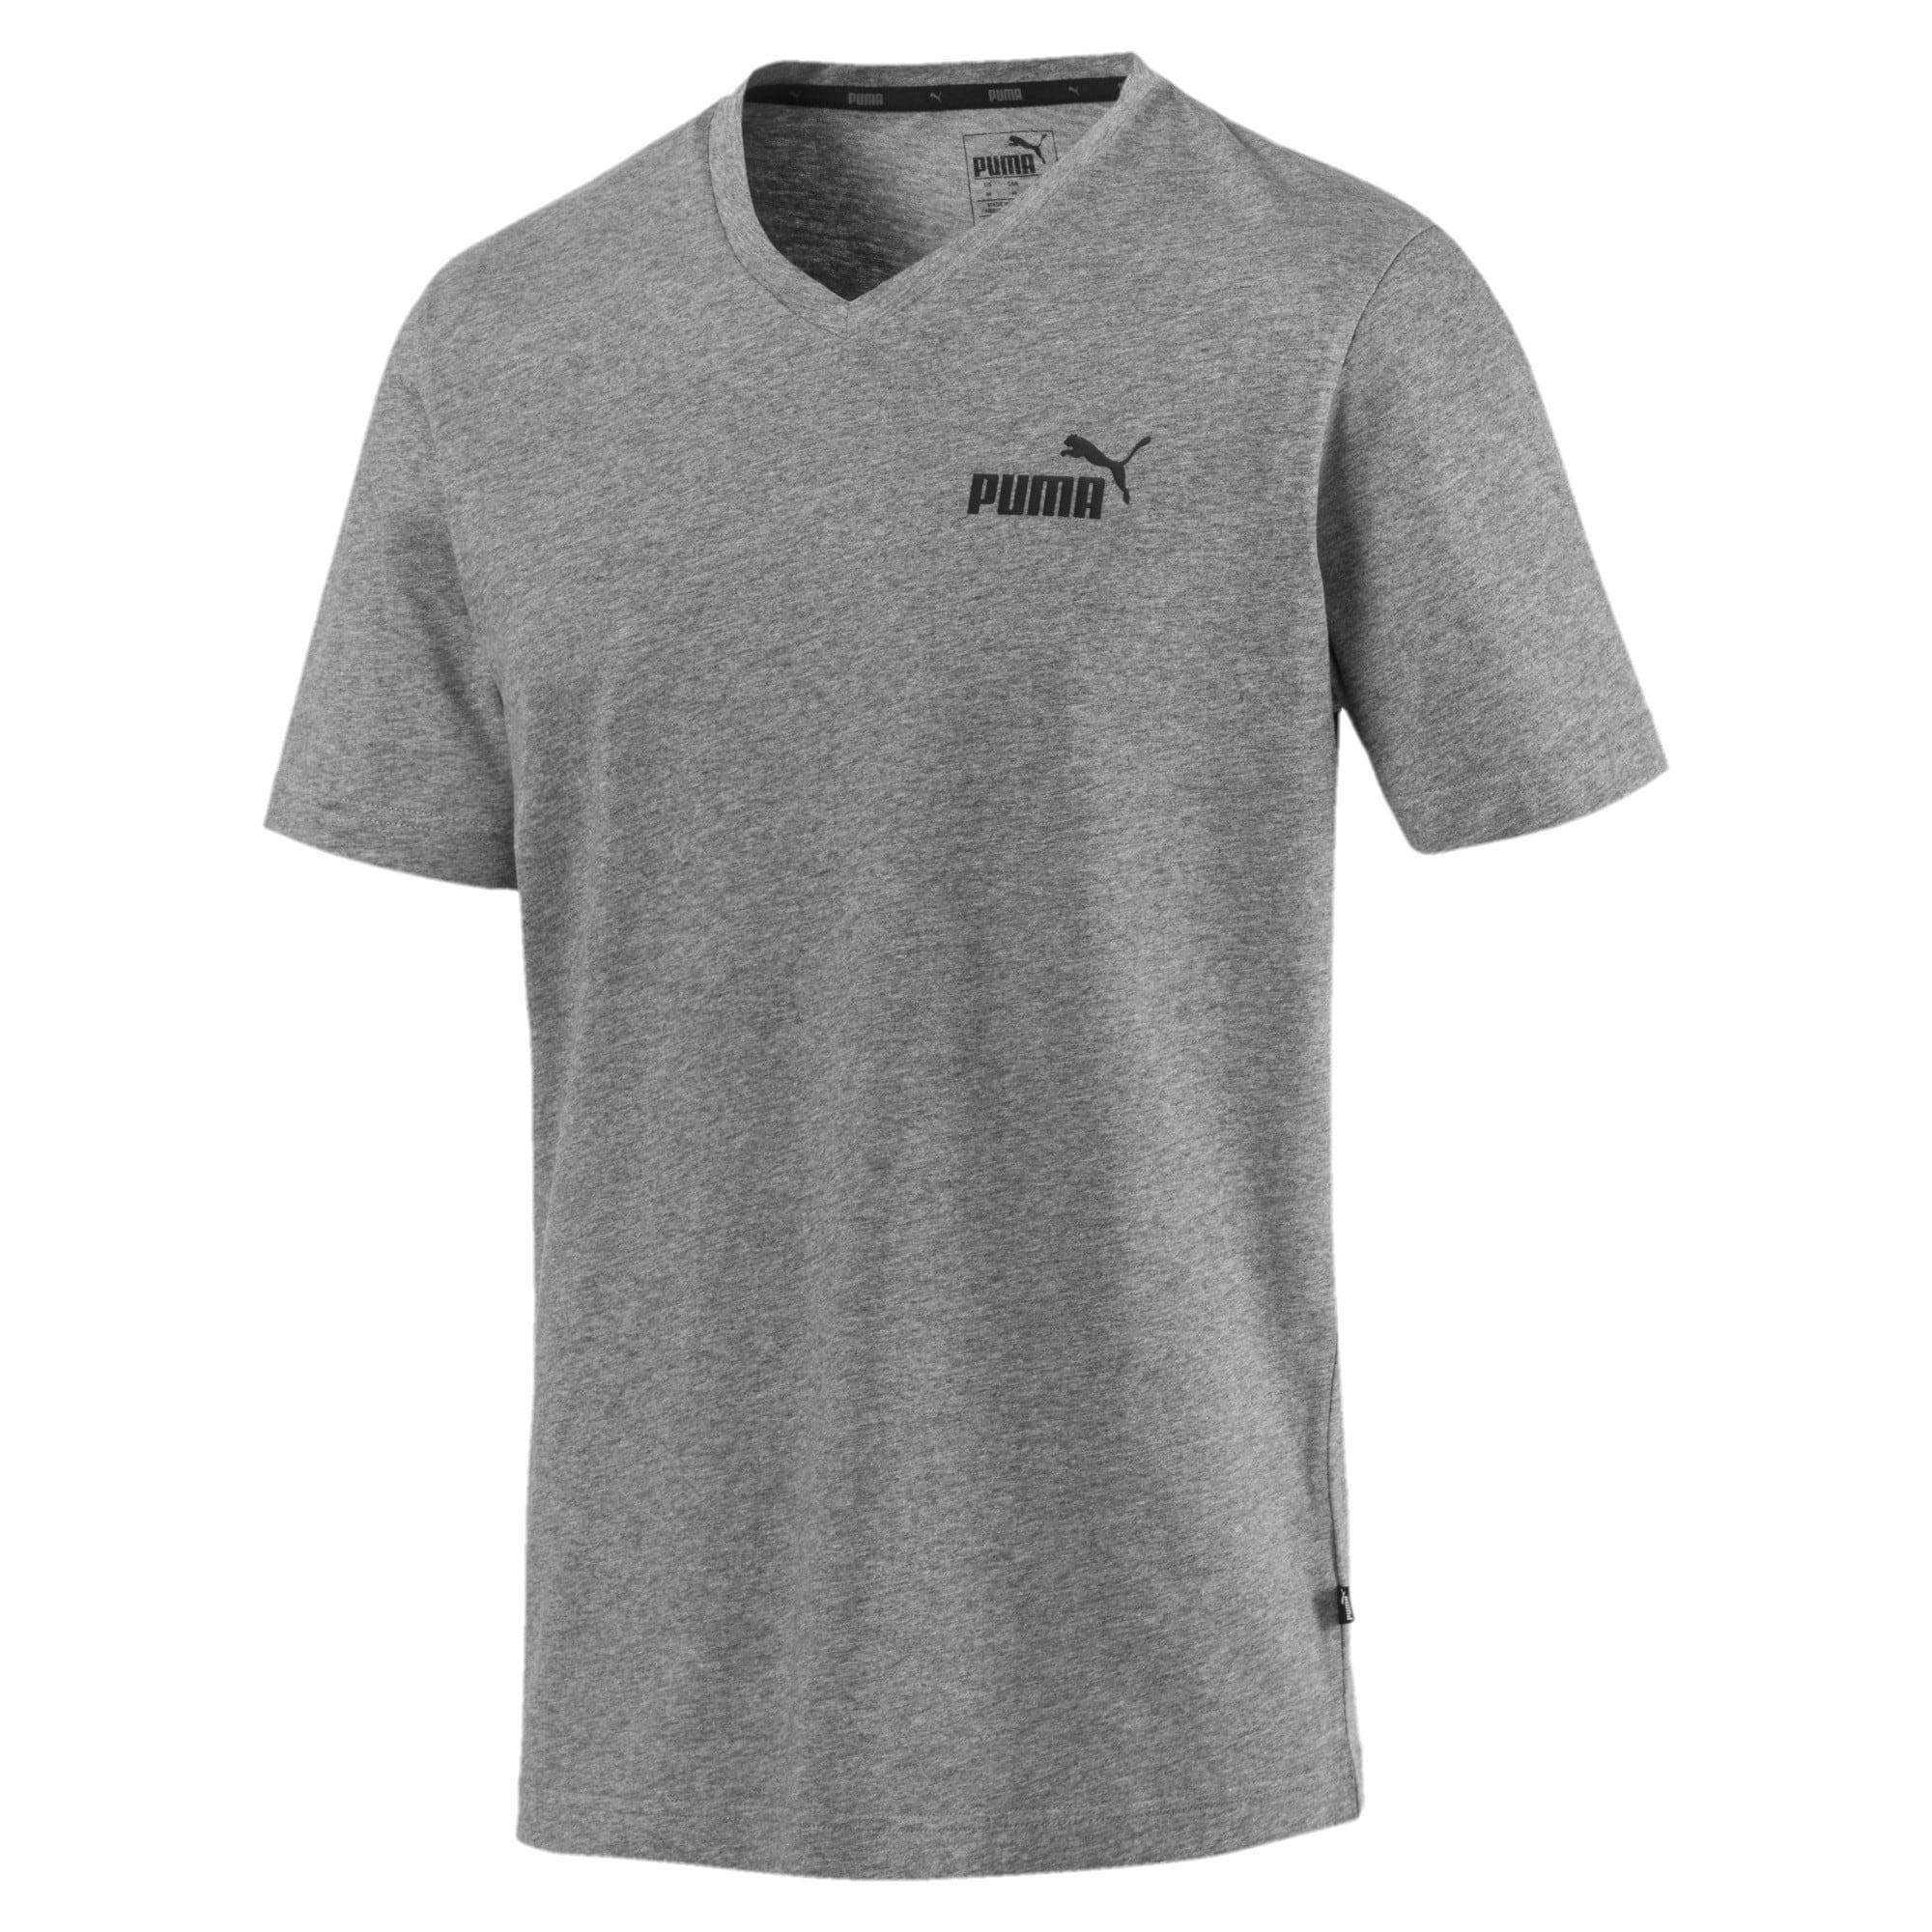 Thumbnail 4 of T-shirt con scollo a V Essentials uomo, Medium Gray Heather, medium